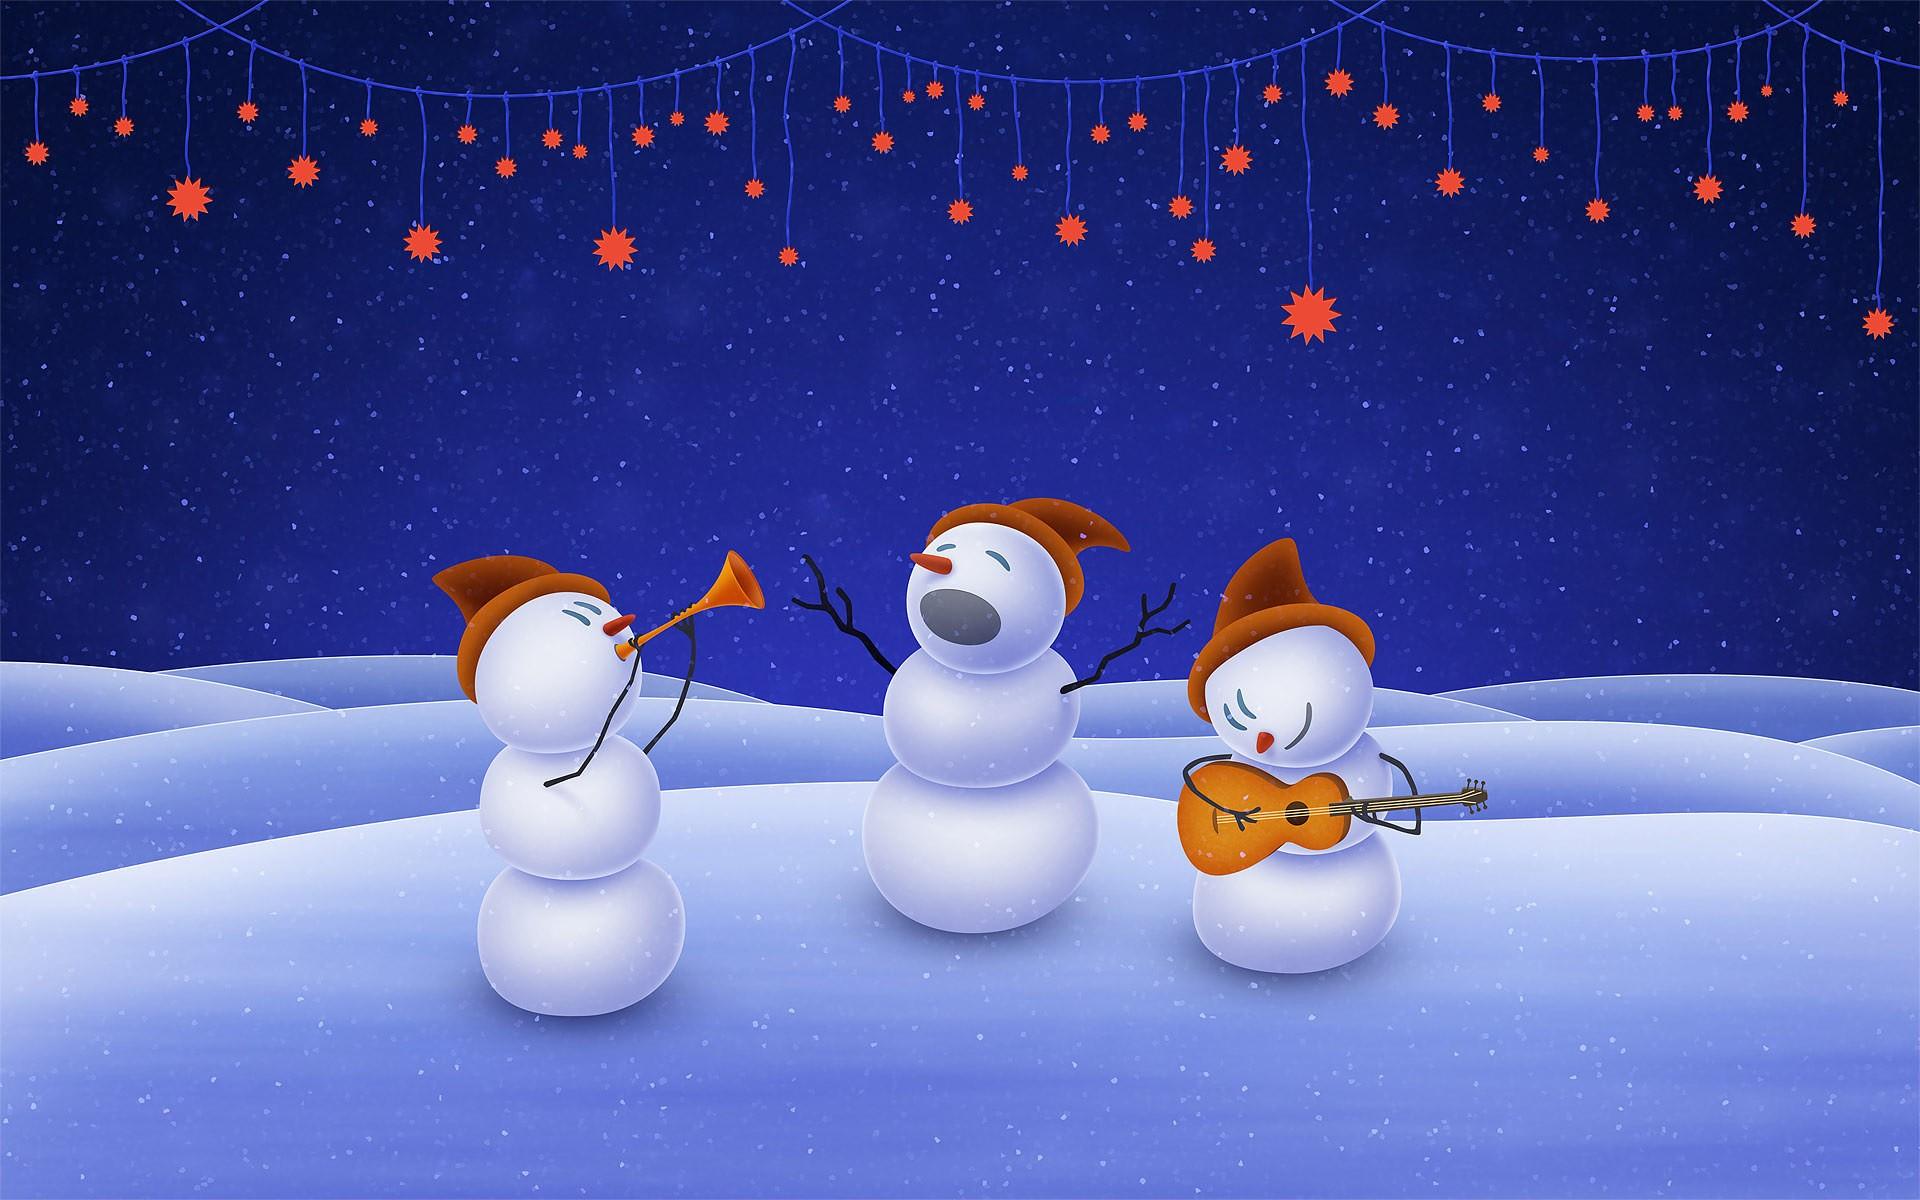 Snowman background download free beautiful high resolution backgrounds for desktop mobile - Lustige wallpaper ...